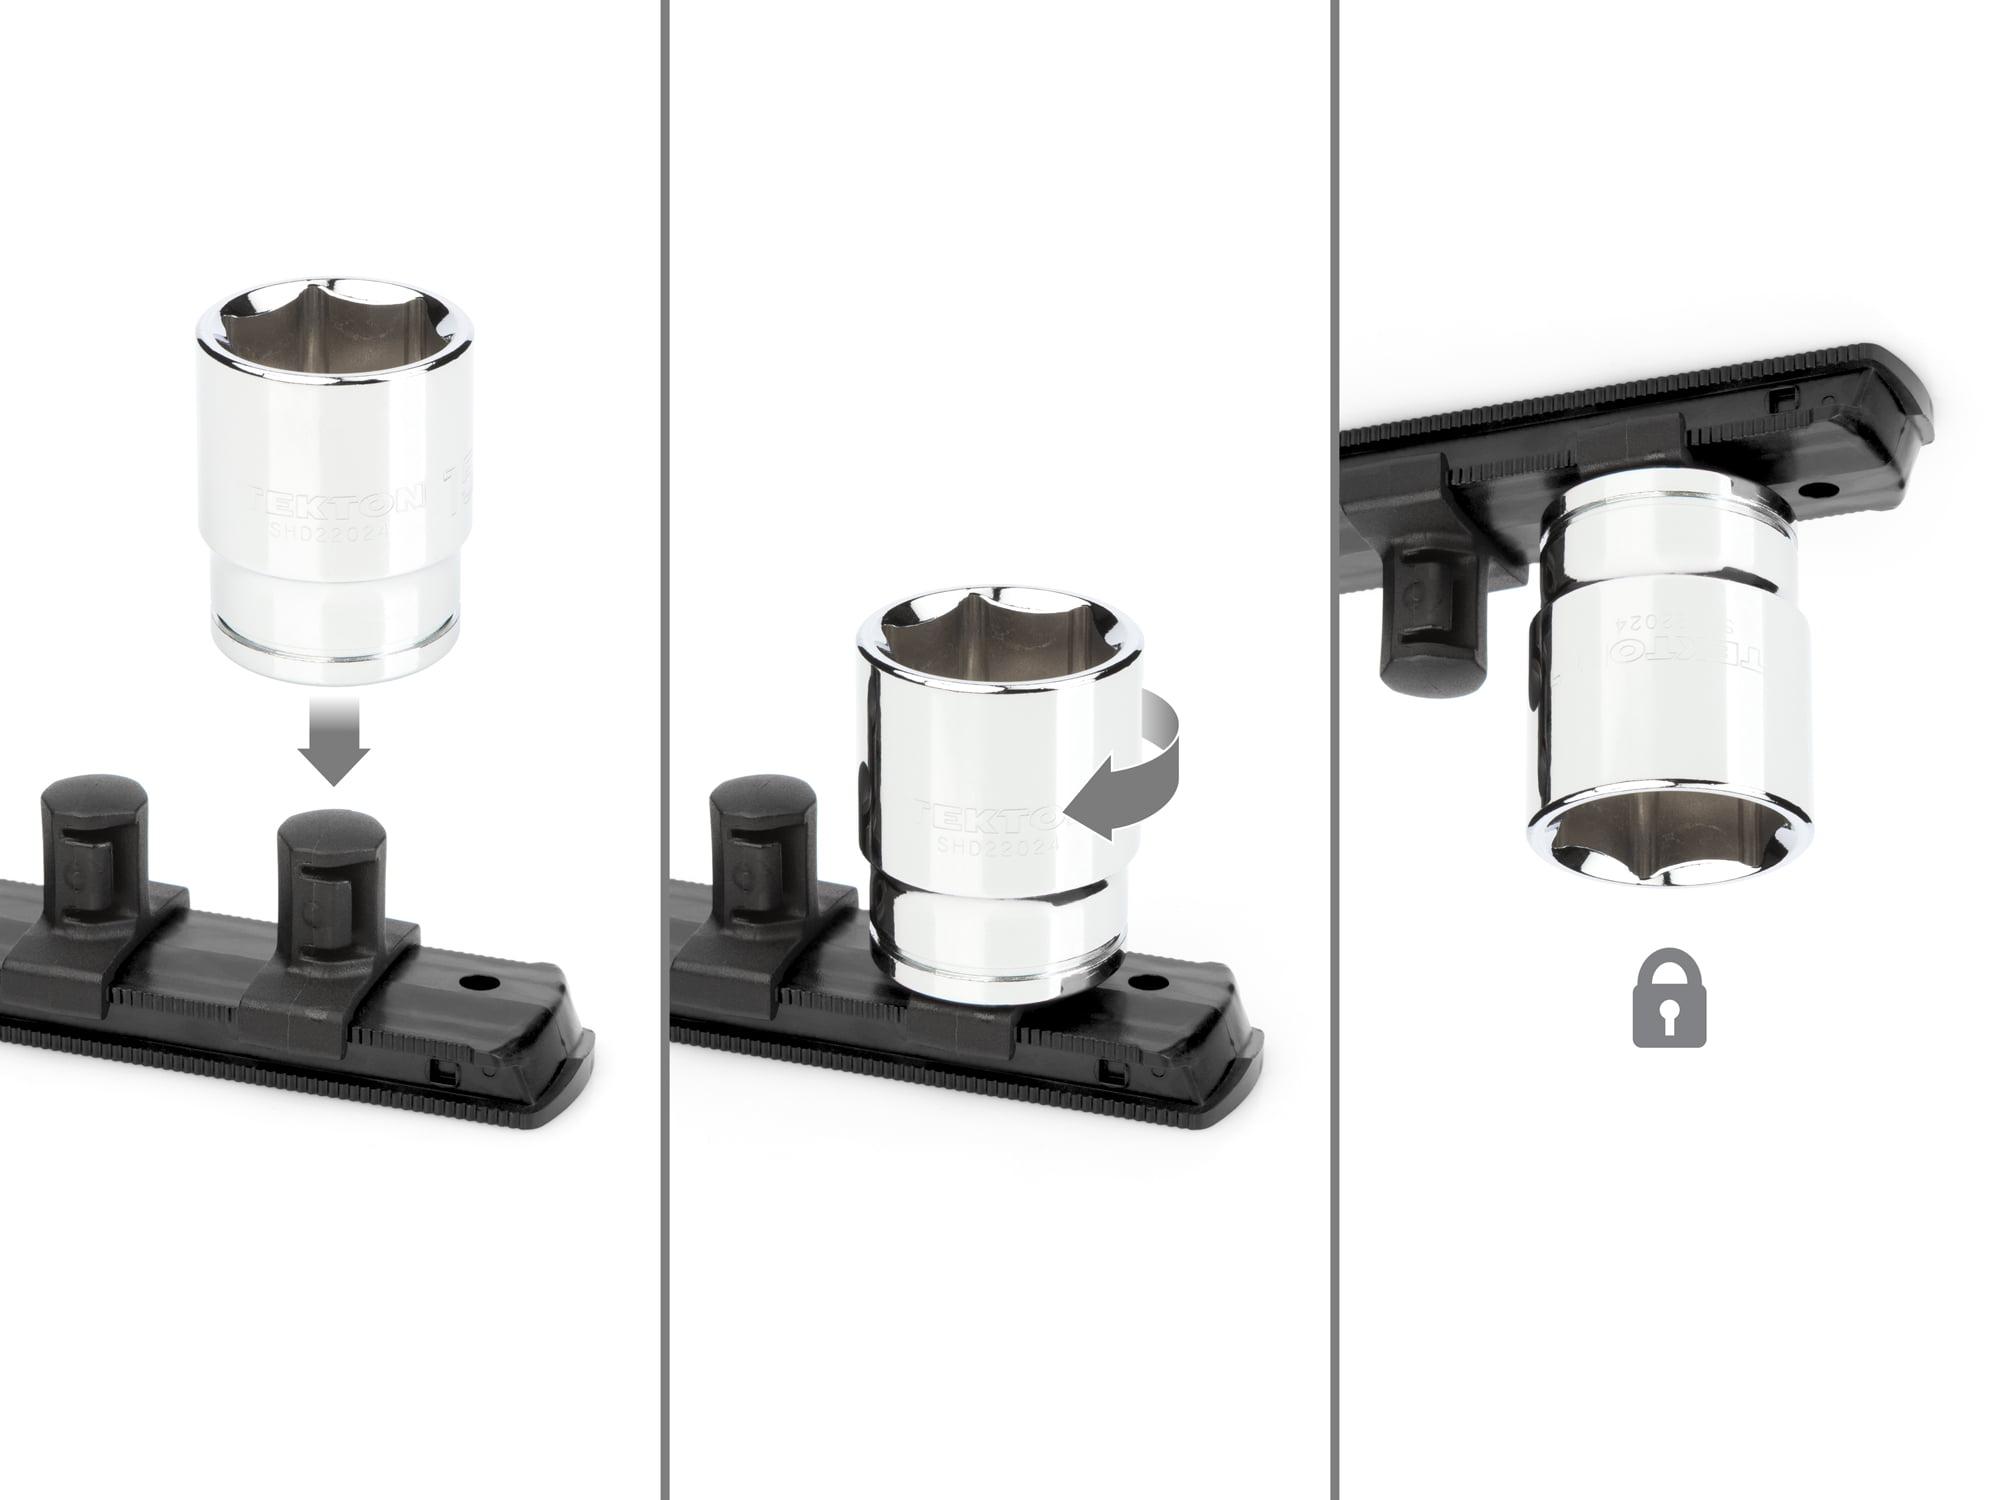 3//8-1 in. 11-Piece TEKTON 1//2 Inch Drive 6-Point Socket Set | SHD92101